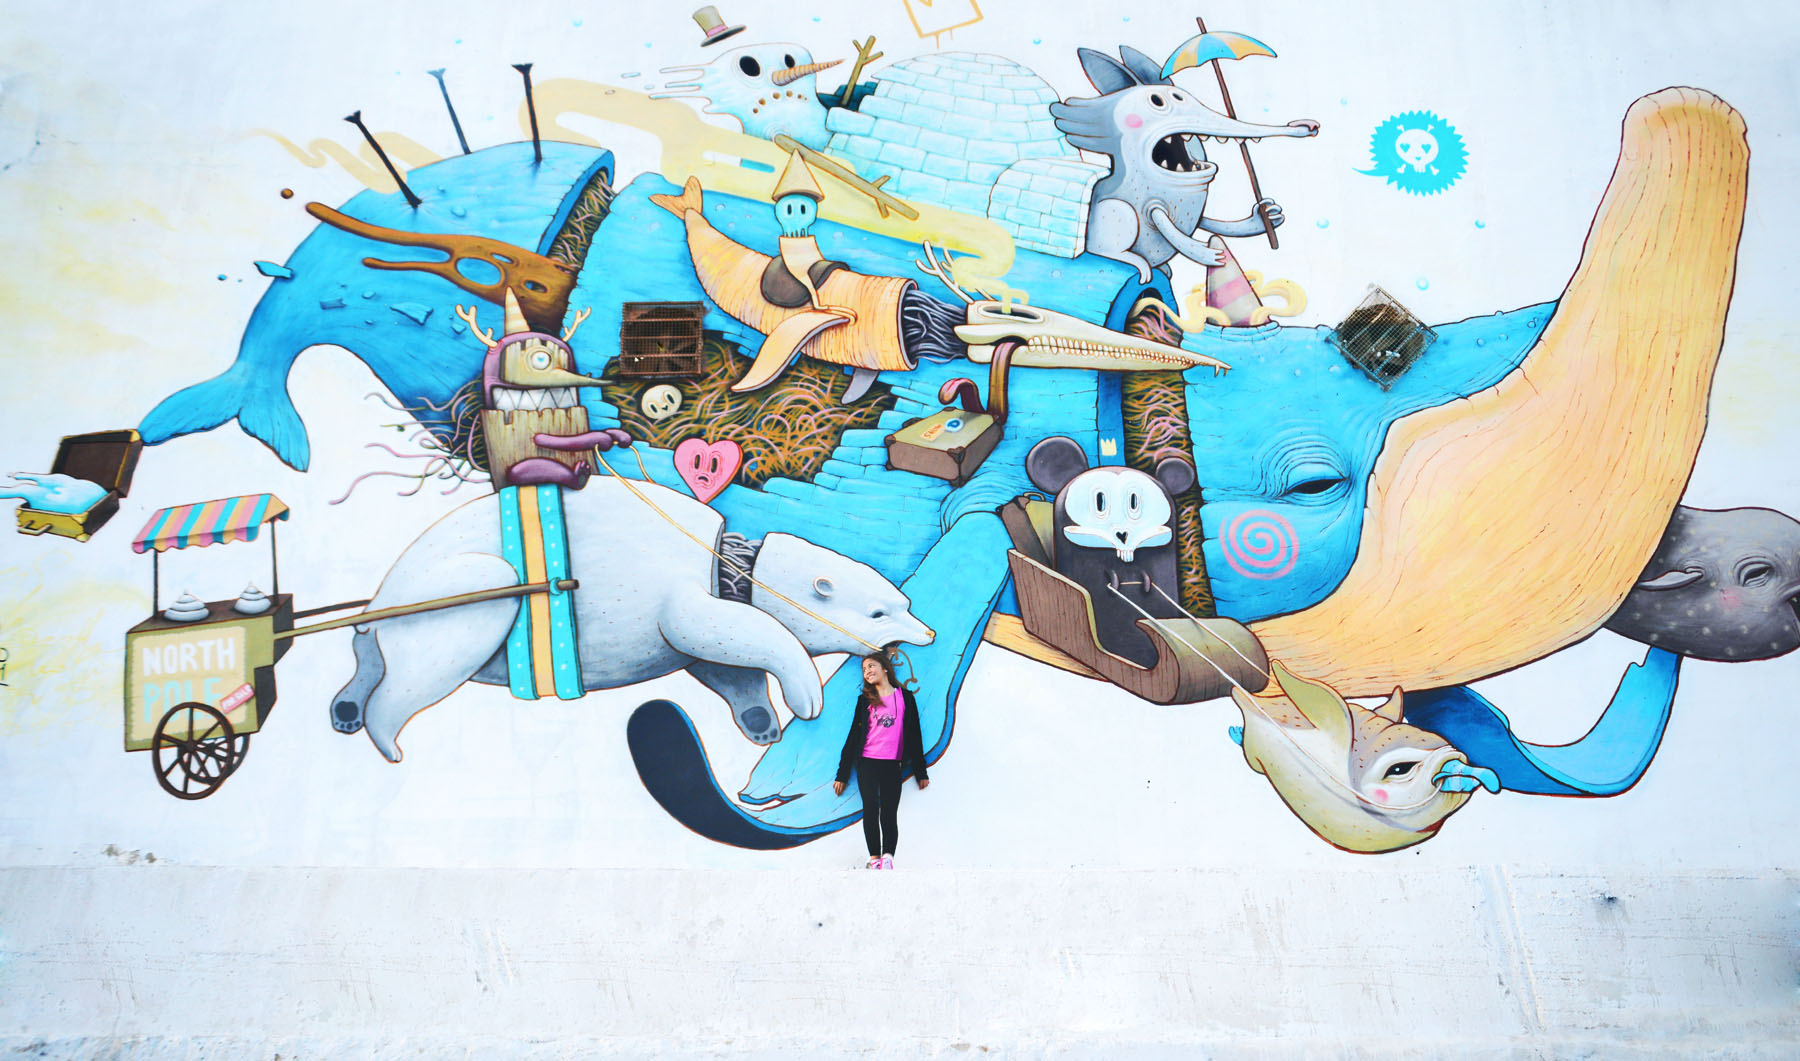 malaga graffitis